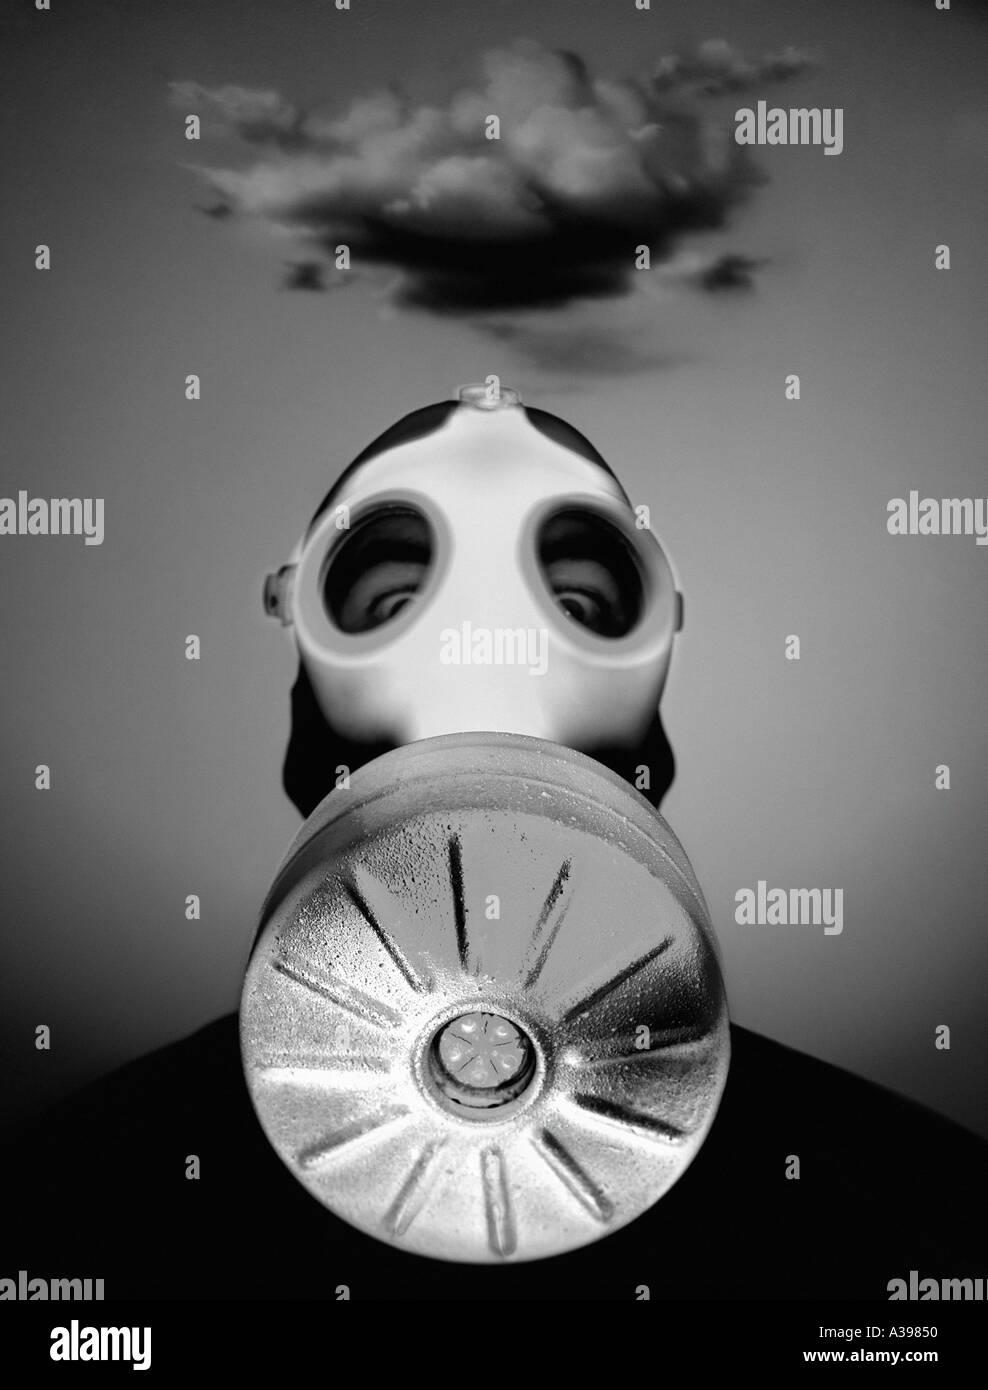 máscara de gas Imagen De Stock